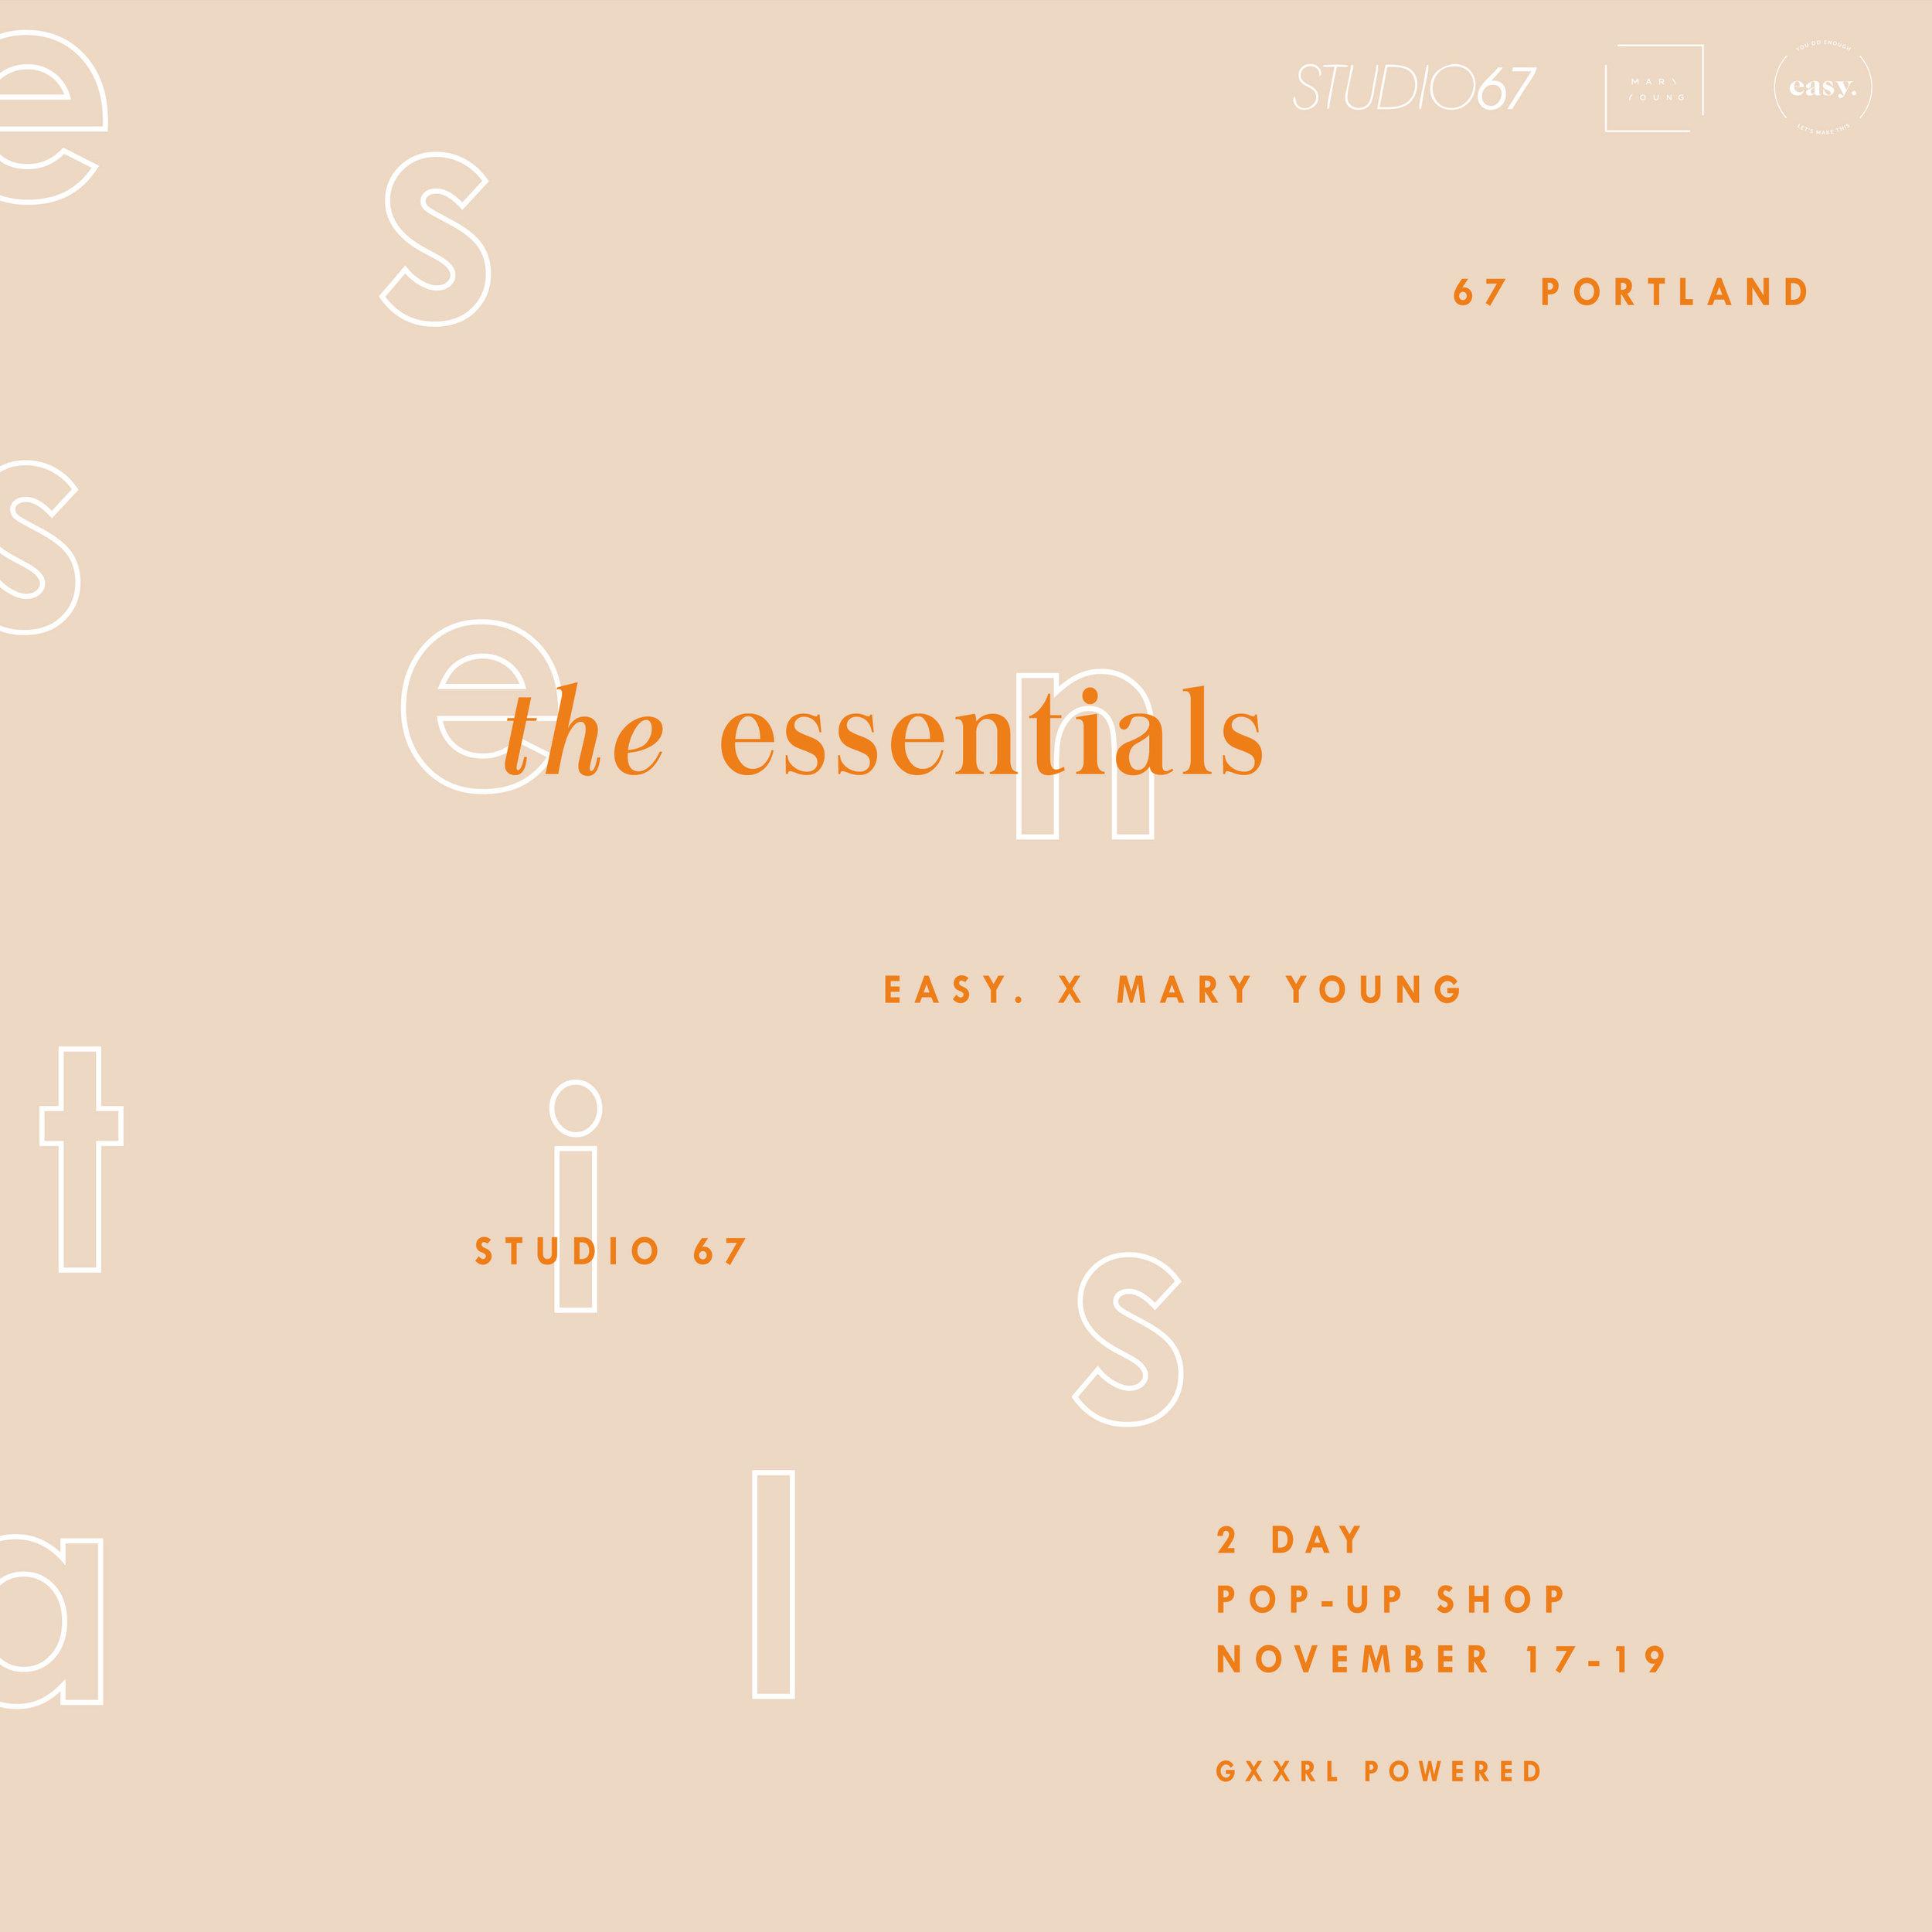 essentials-insta-edit3.jpg